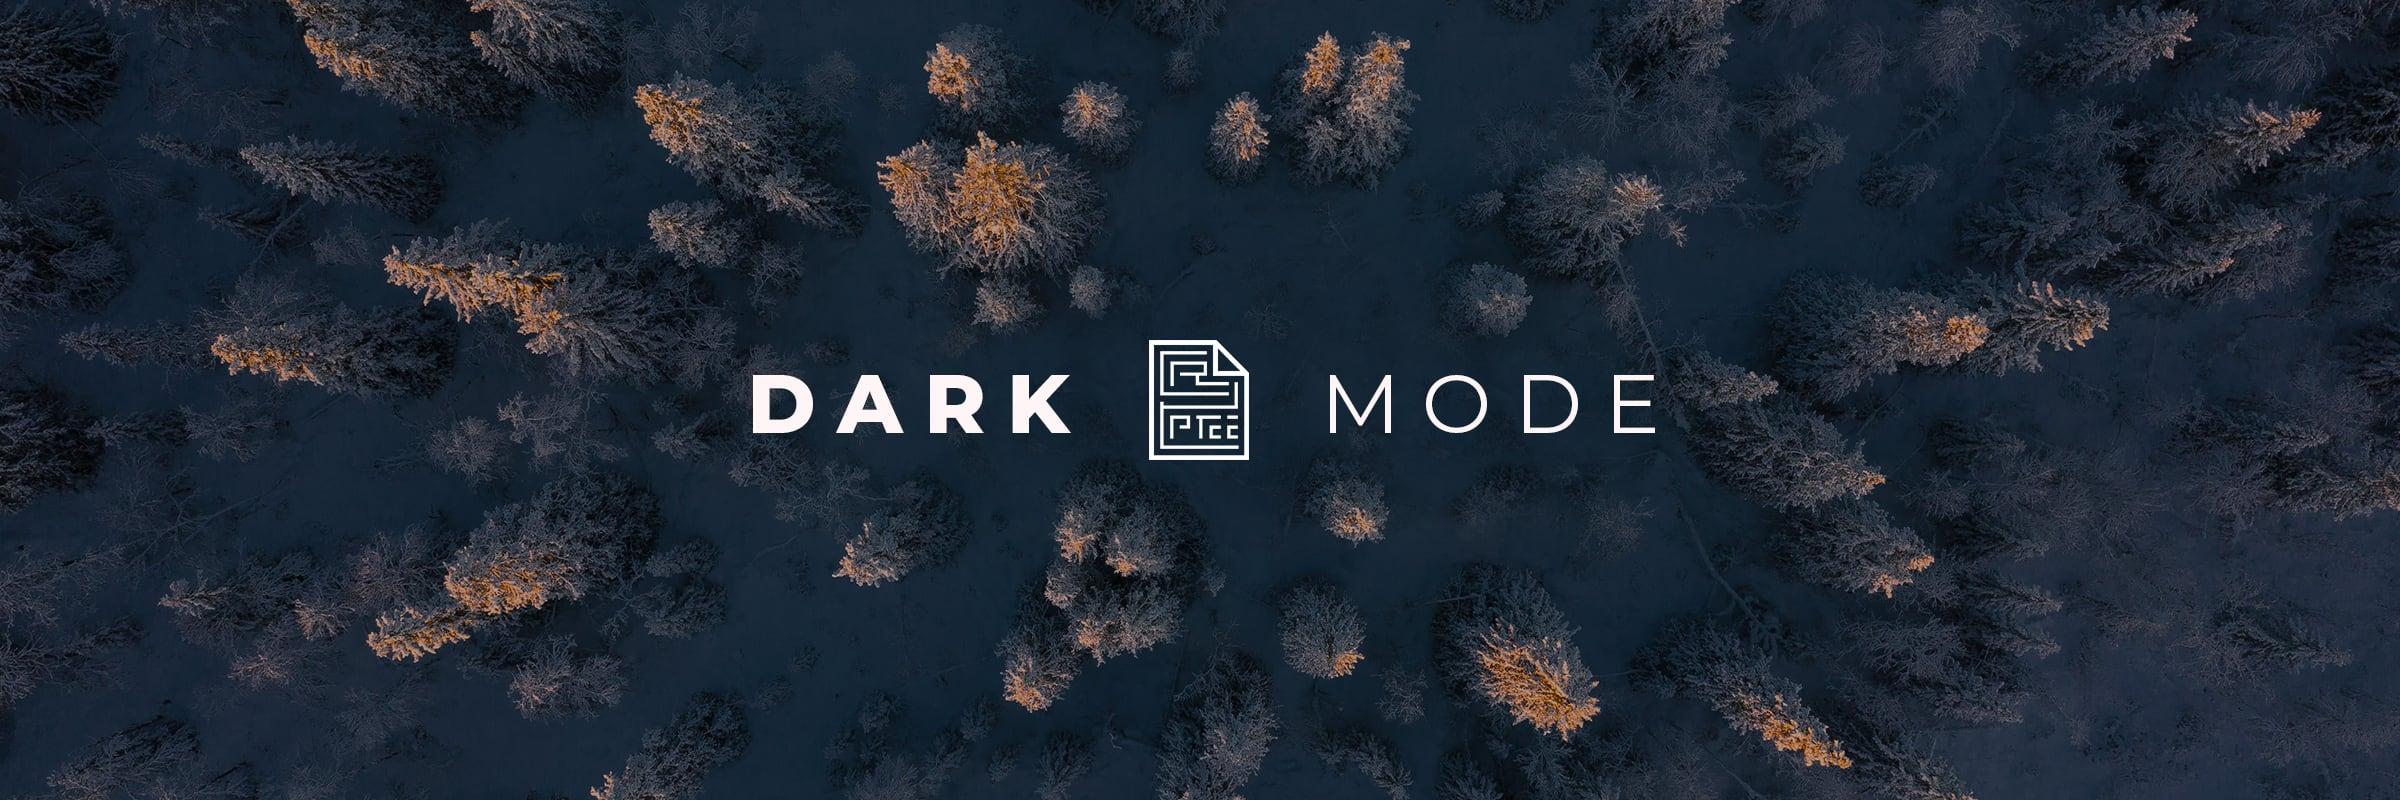 dark-mode